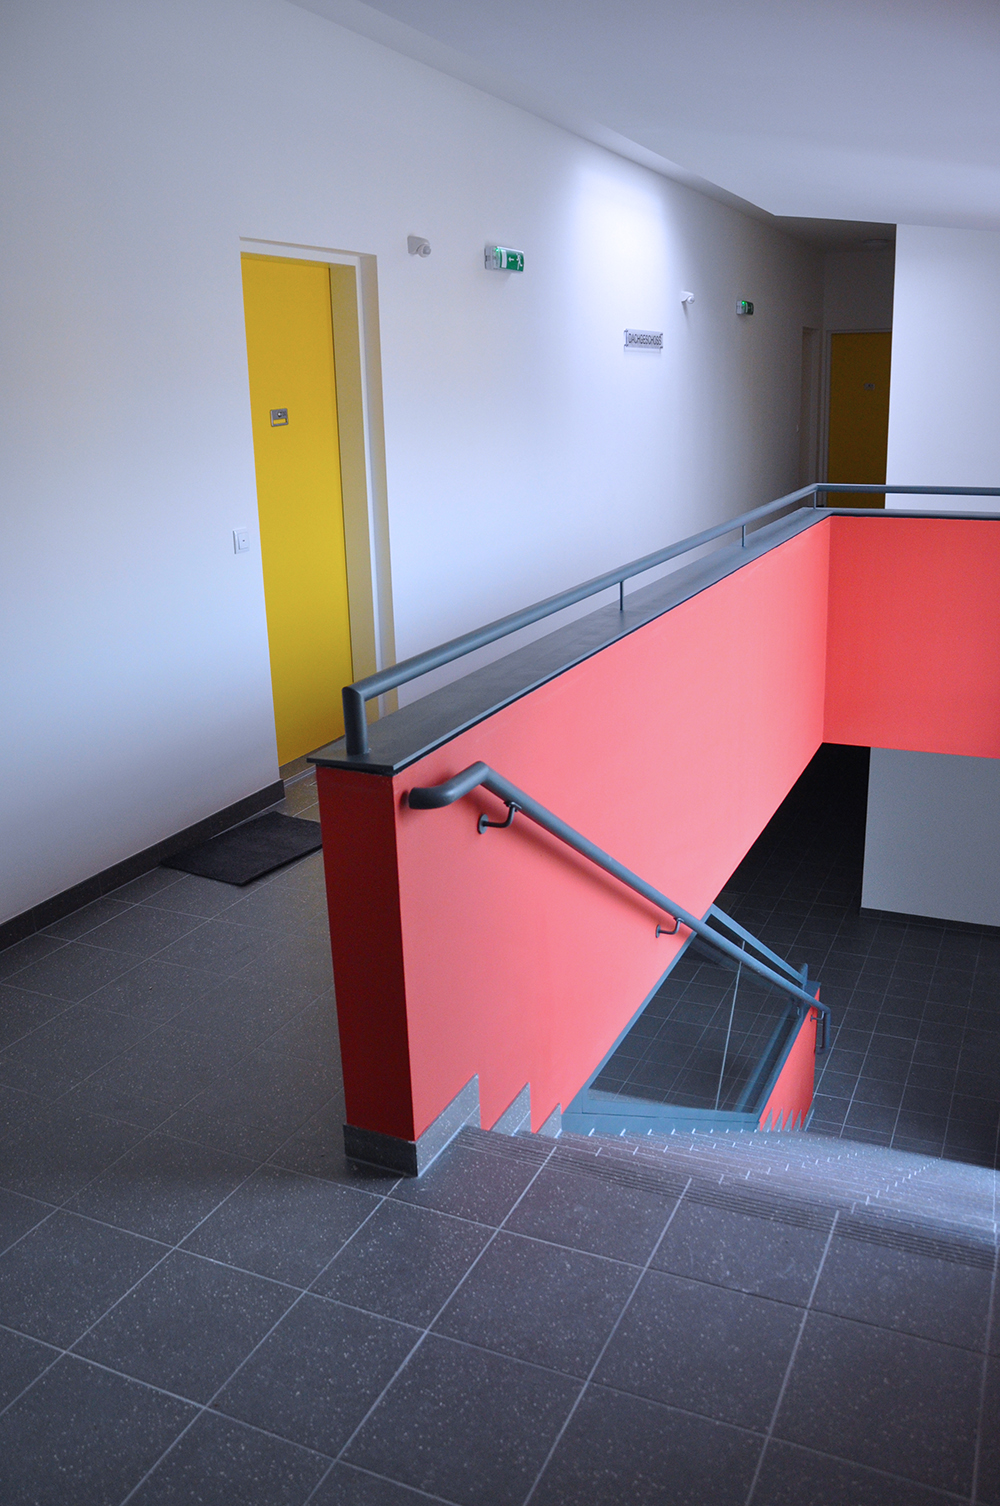 GMMK, Gert M. Mayr-Keber ZT-GmbH, Wohnhaus in Stadlau, 2011-2014, Photo: DI Johanna Mayr-Keber